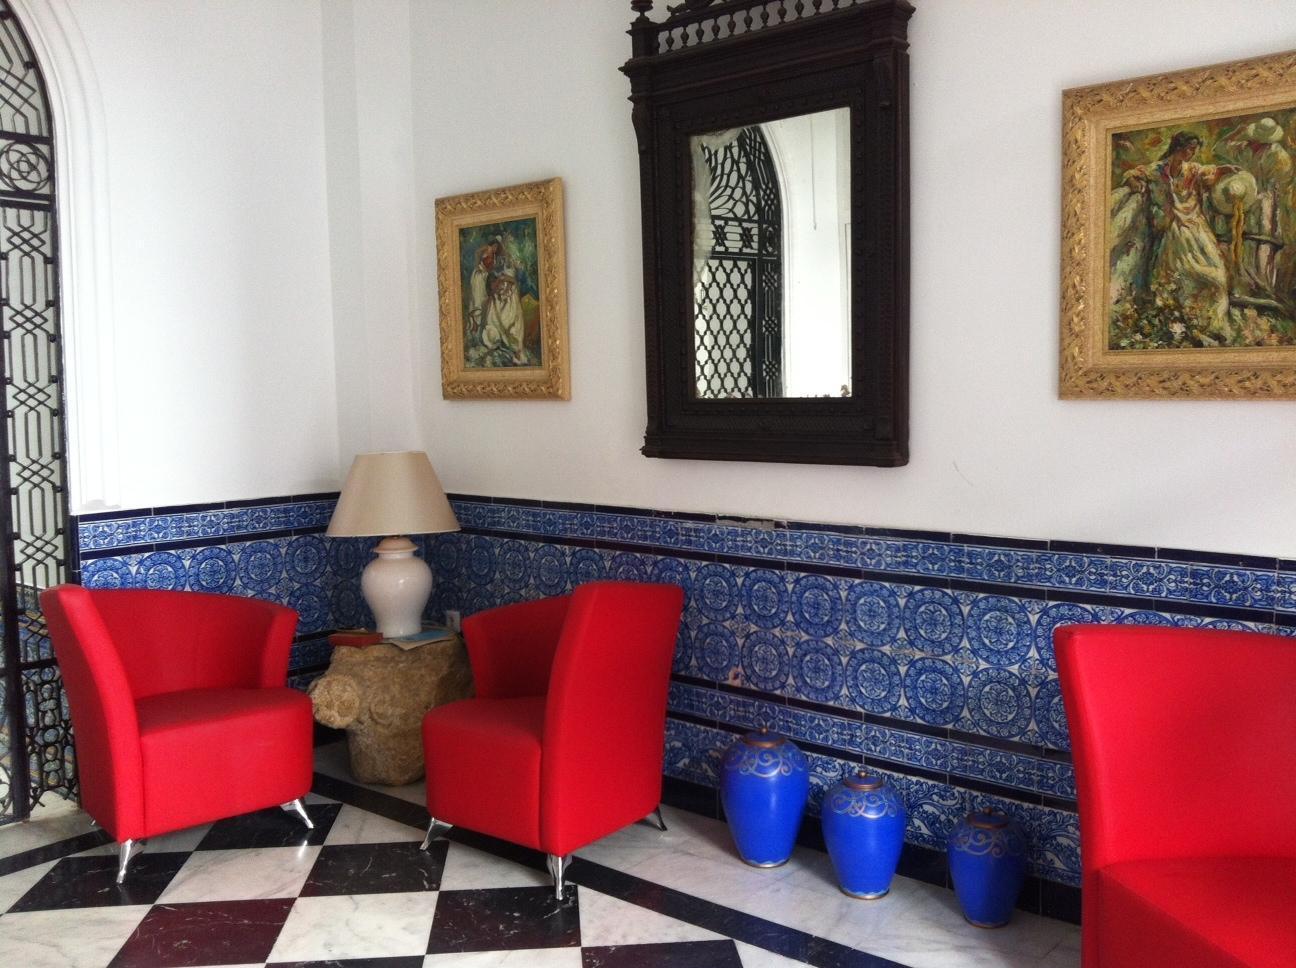 Best Price On Cool Sevilla Hotel In Seville Reviews # Meuble Tv Sonorise